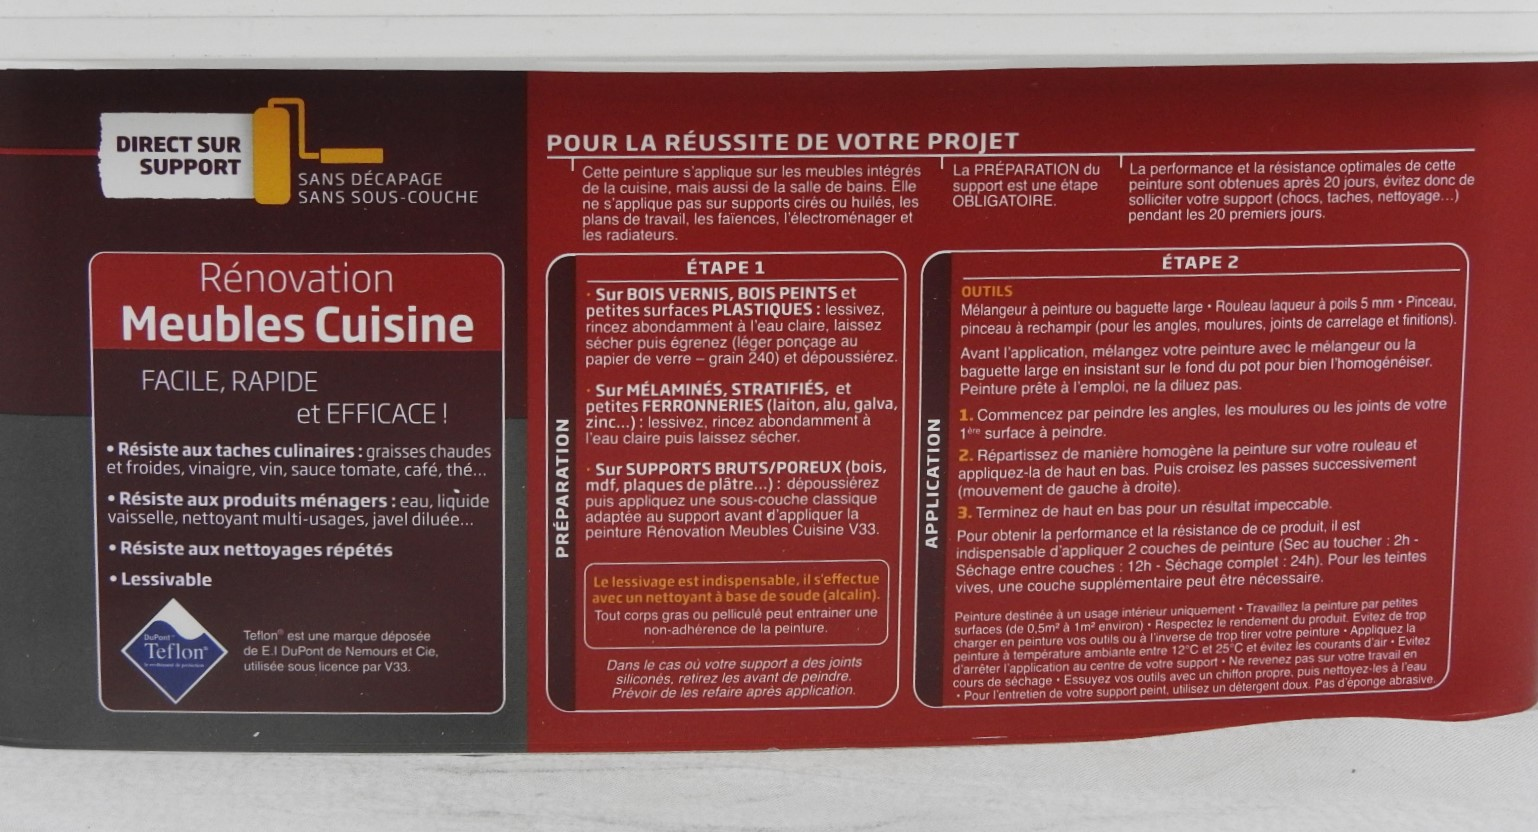 peinture-satinee-renovation-meubles-cuisine-v33-2l-2